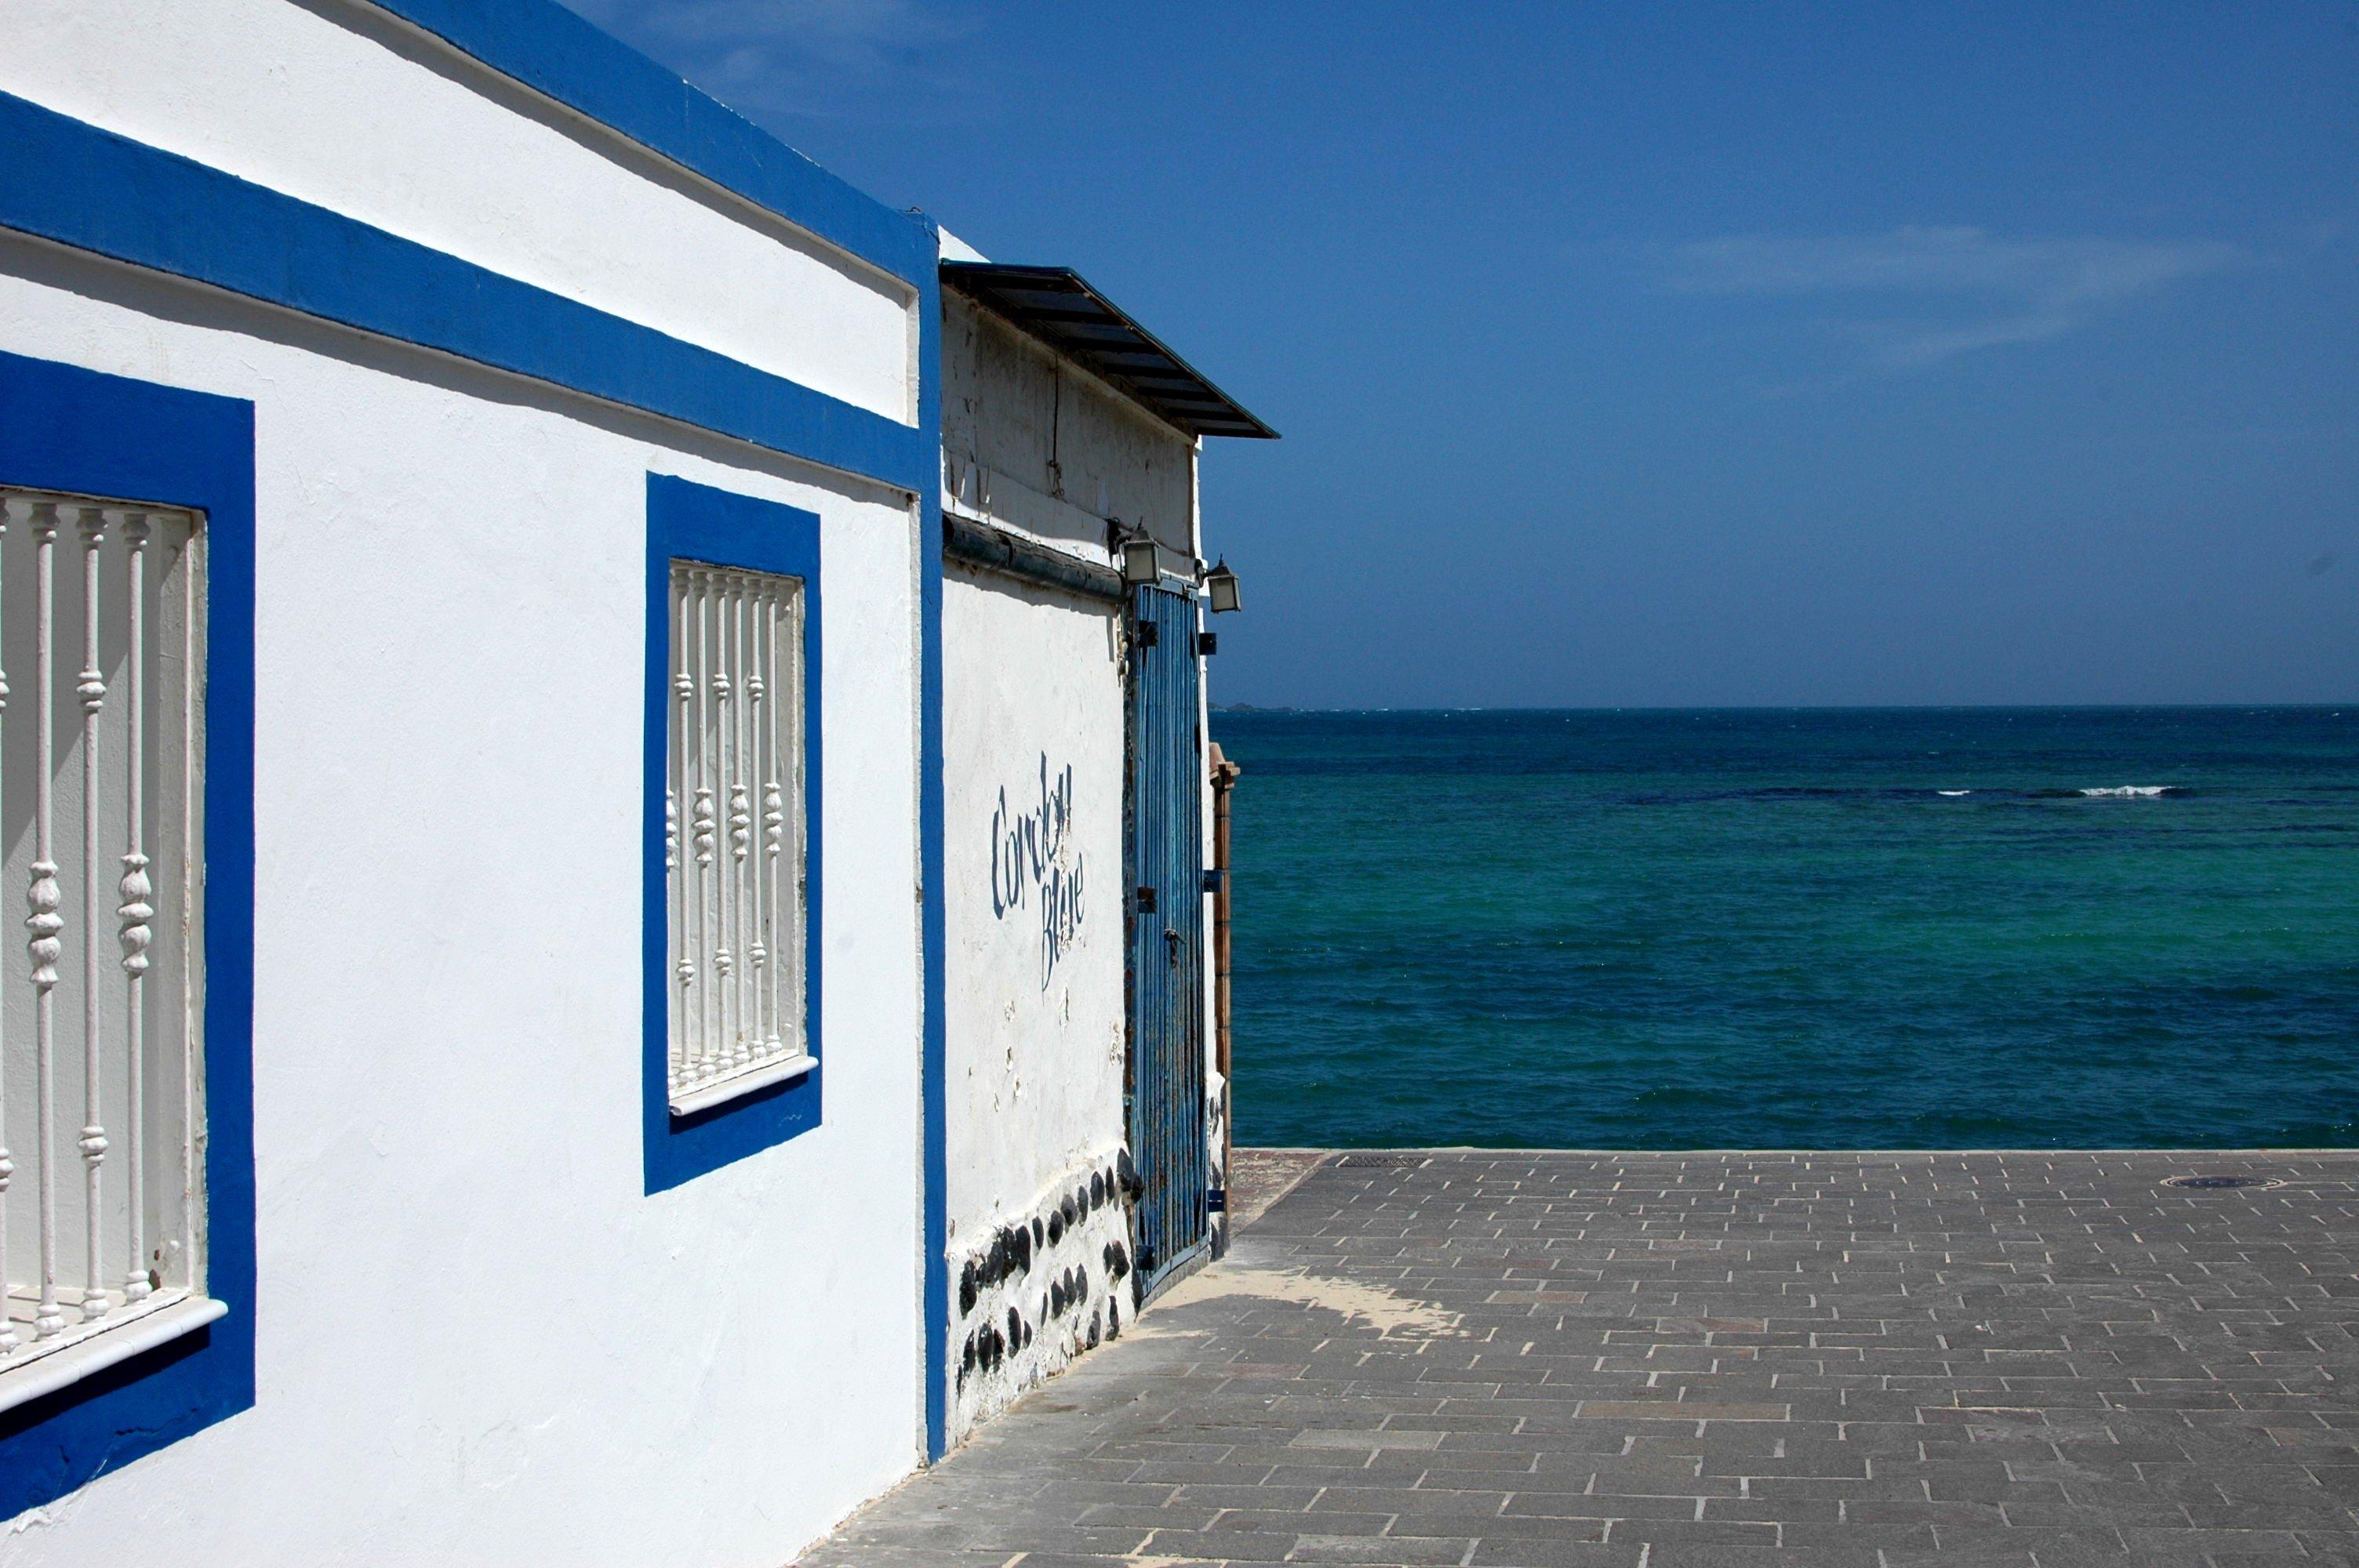 Corralejo, Fuerteventura Travel Guide and Photo Diary